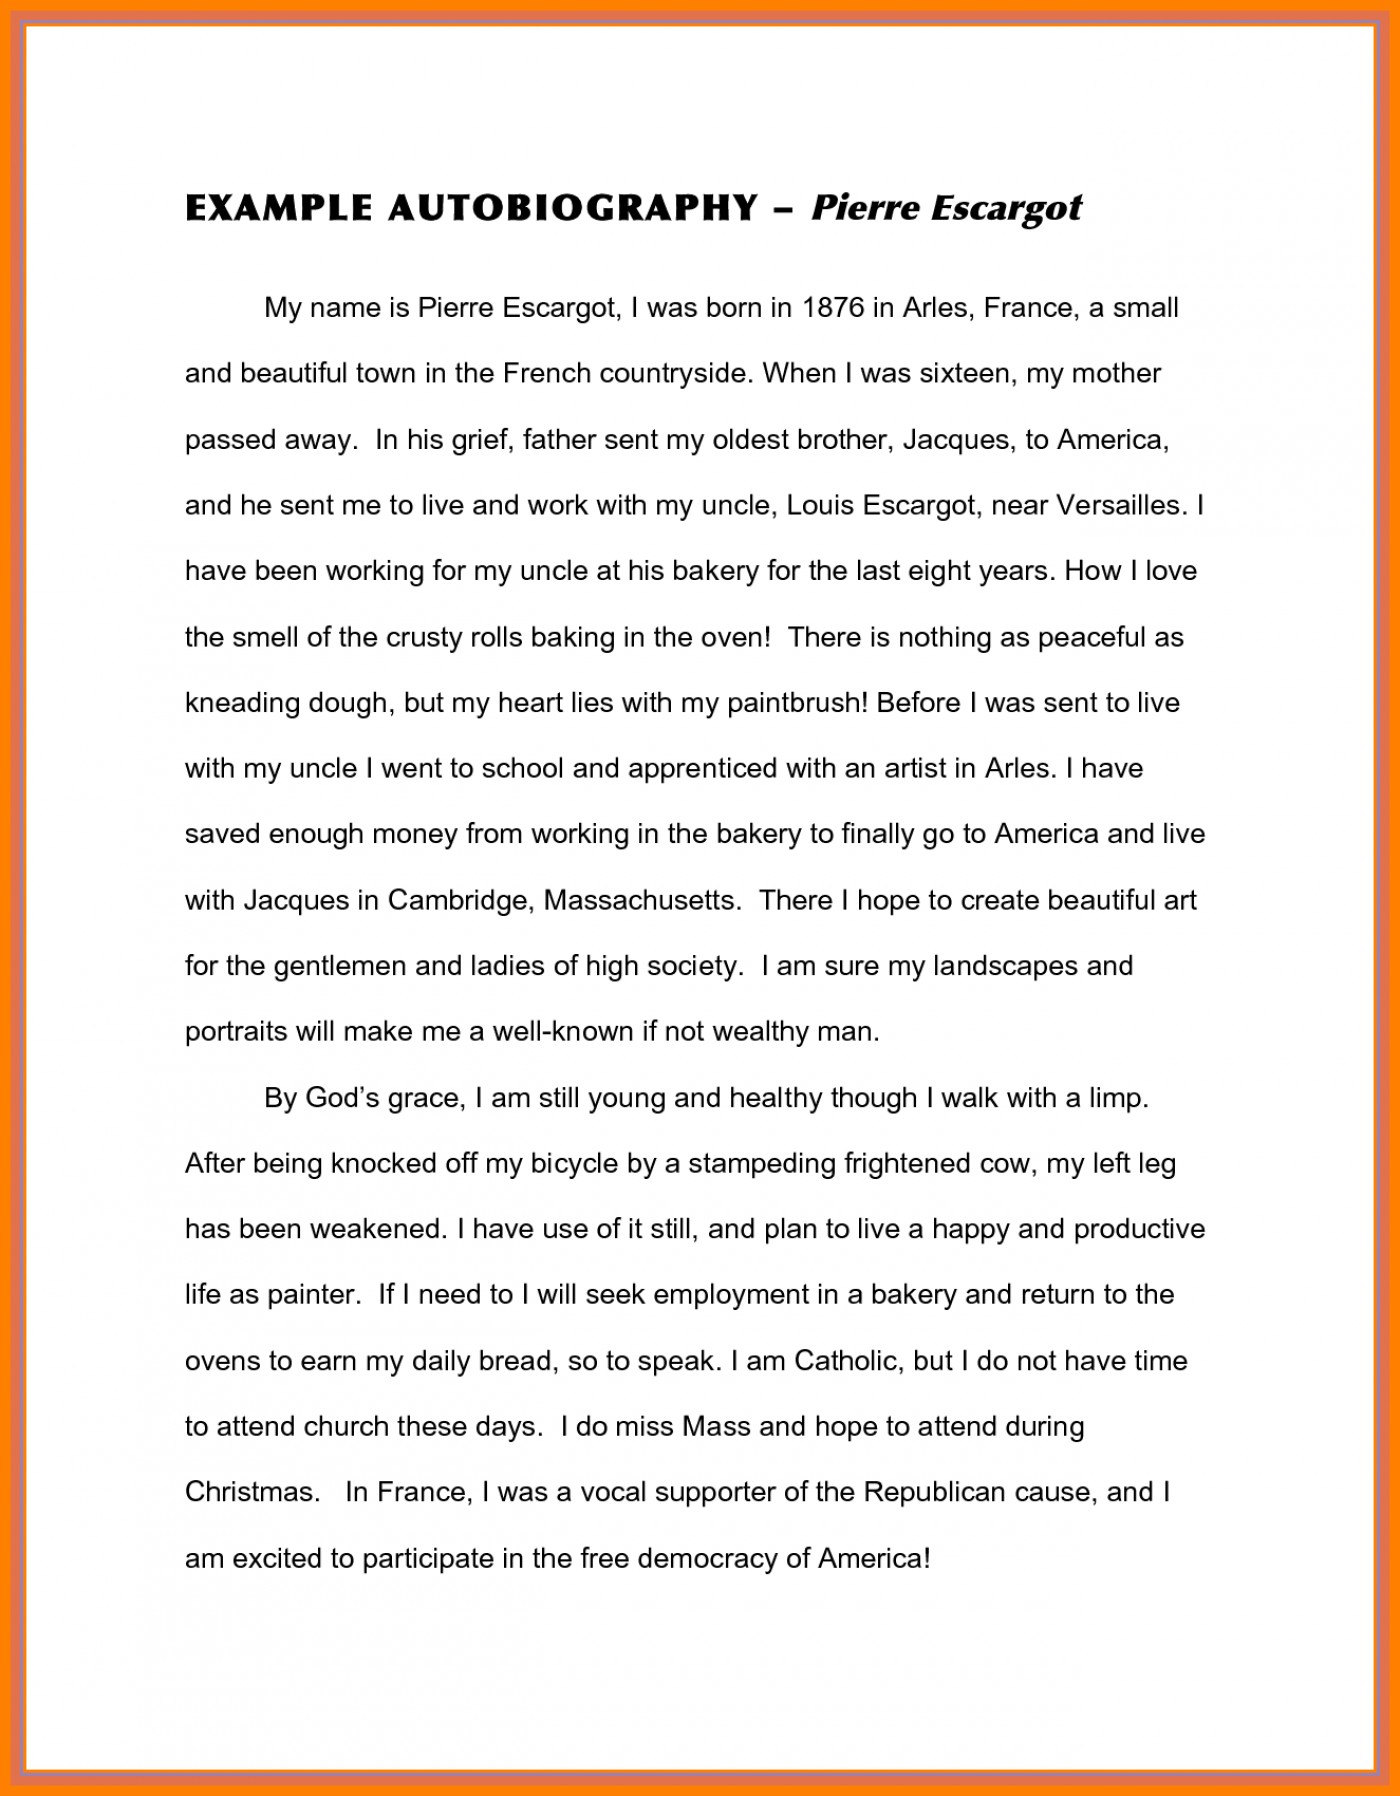 English Essays Book  English Essay Internet also Apa Format Essay Paper  Biography Essay Example Autobiographysample  Thatsnotus History Of English Essay